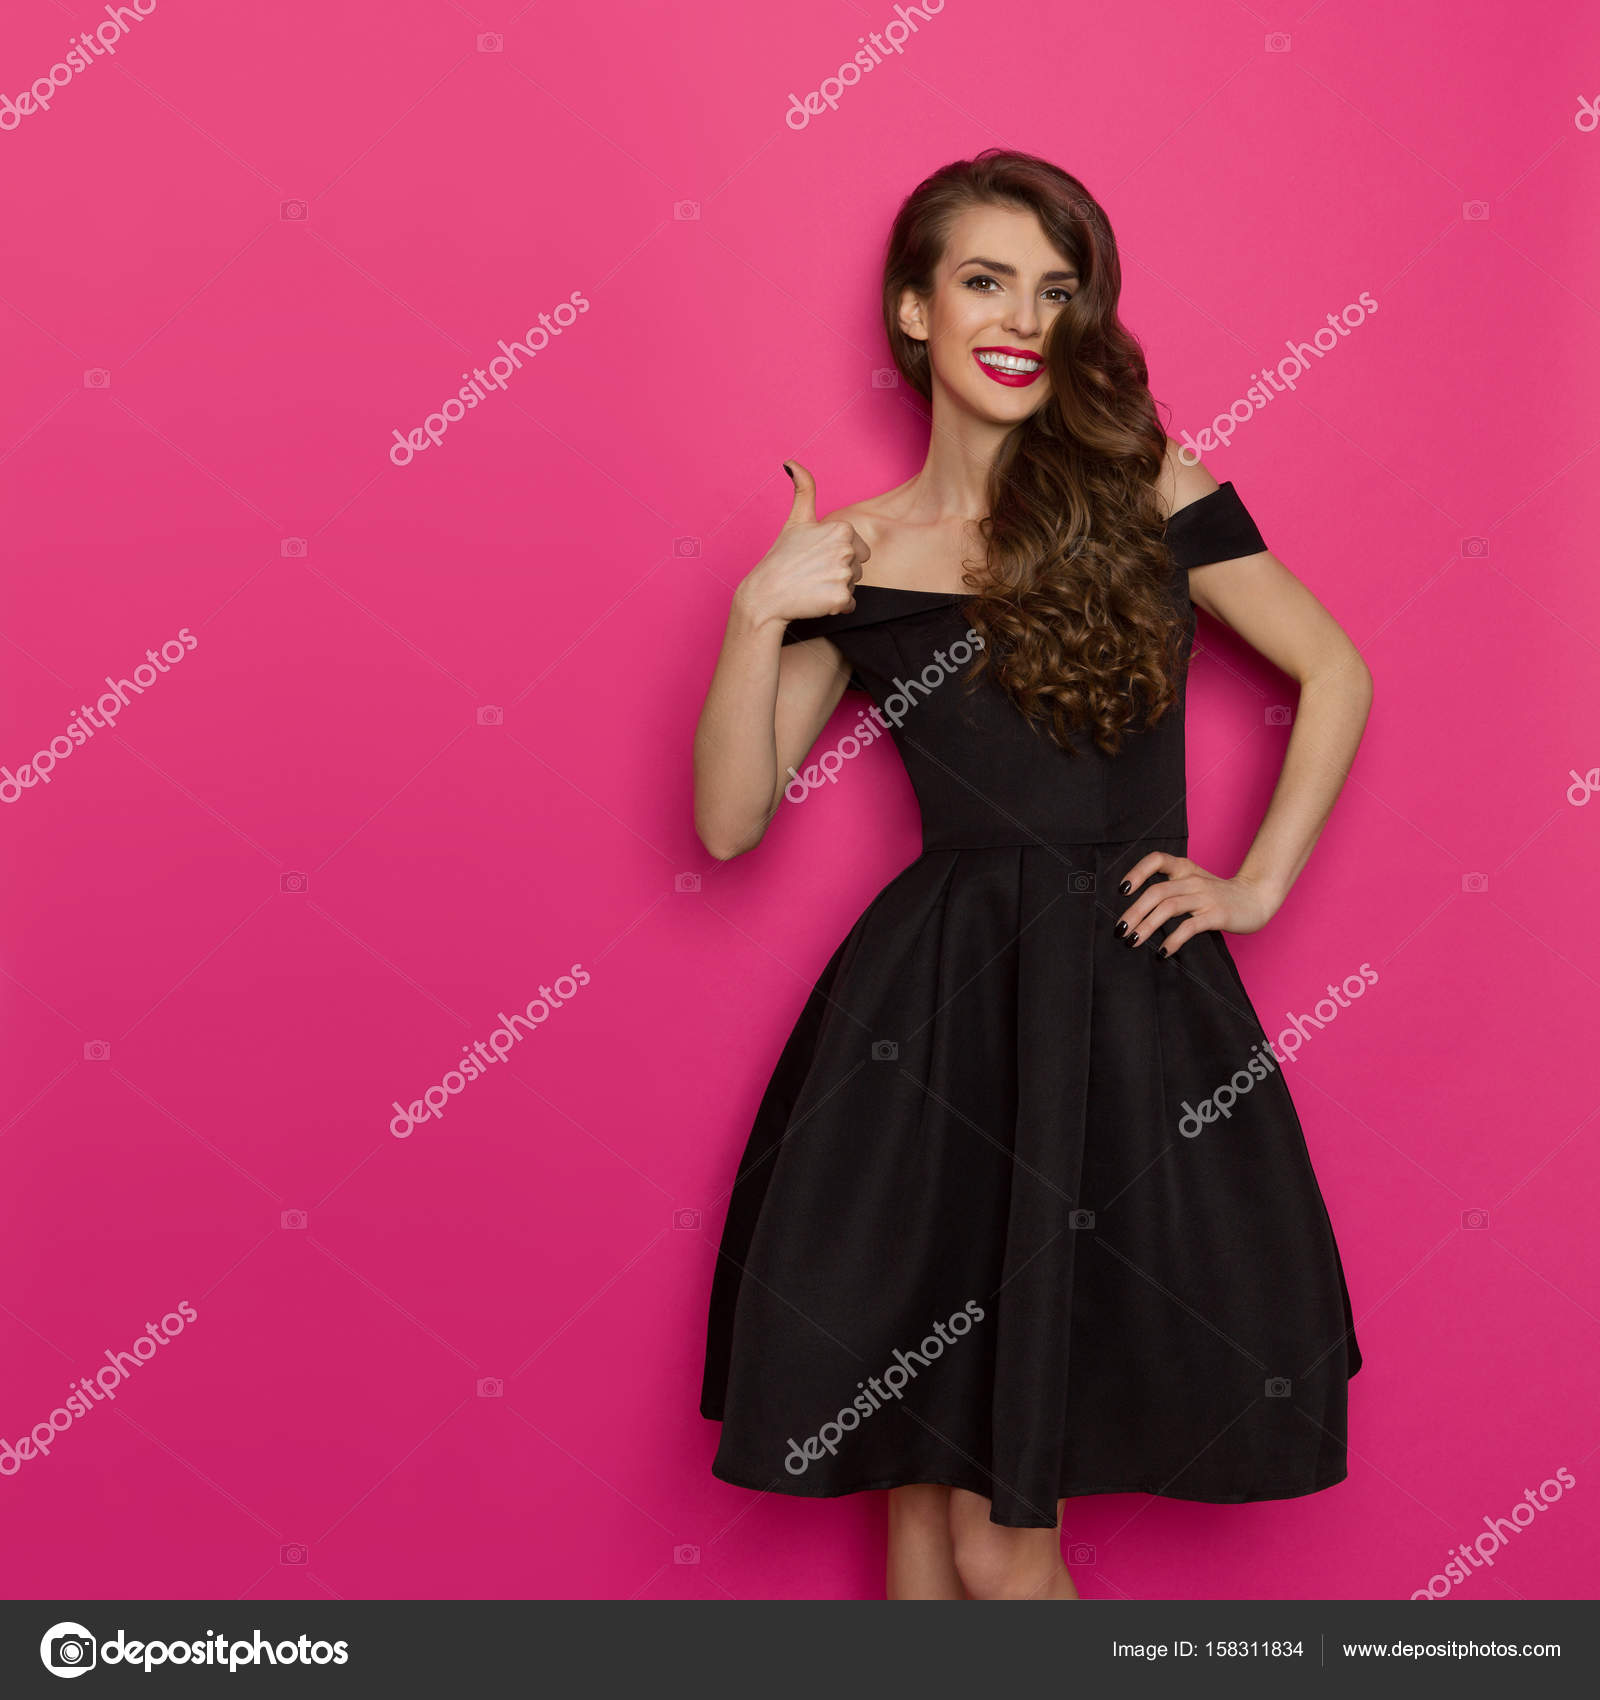 Modelo de moda elegante mostrando pulgar — Foto de stock ...